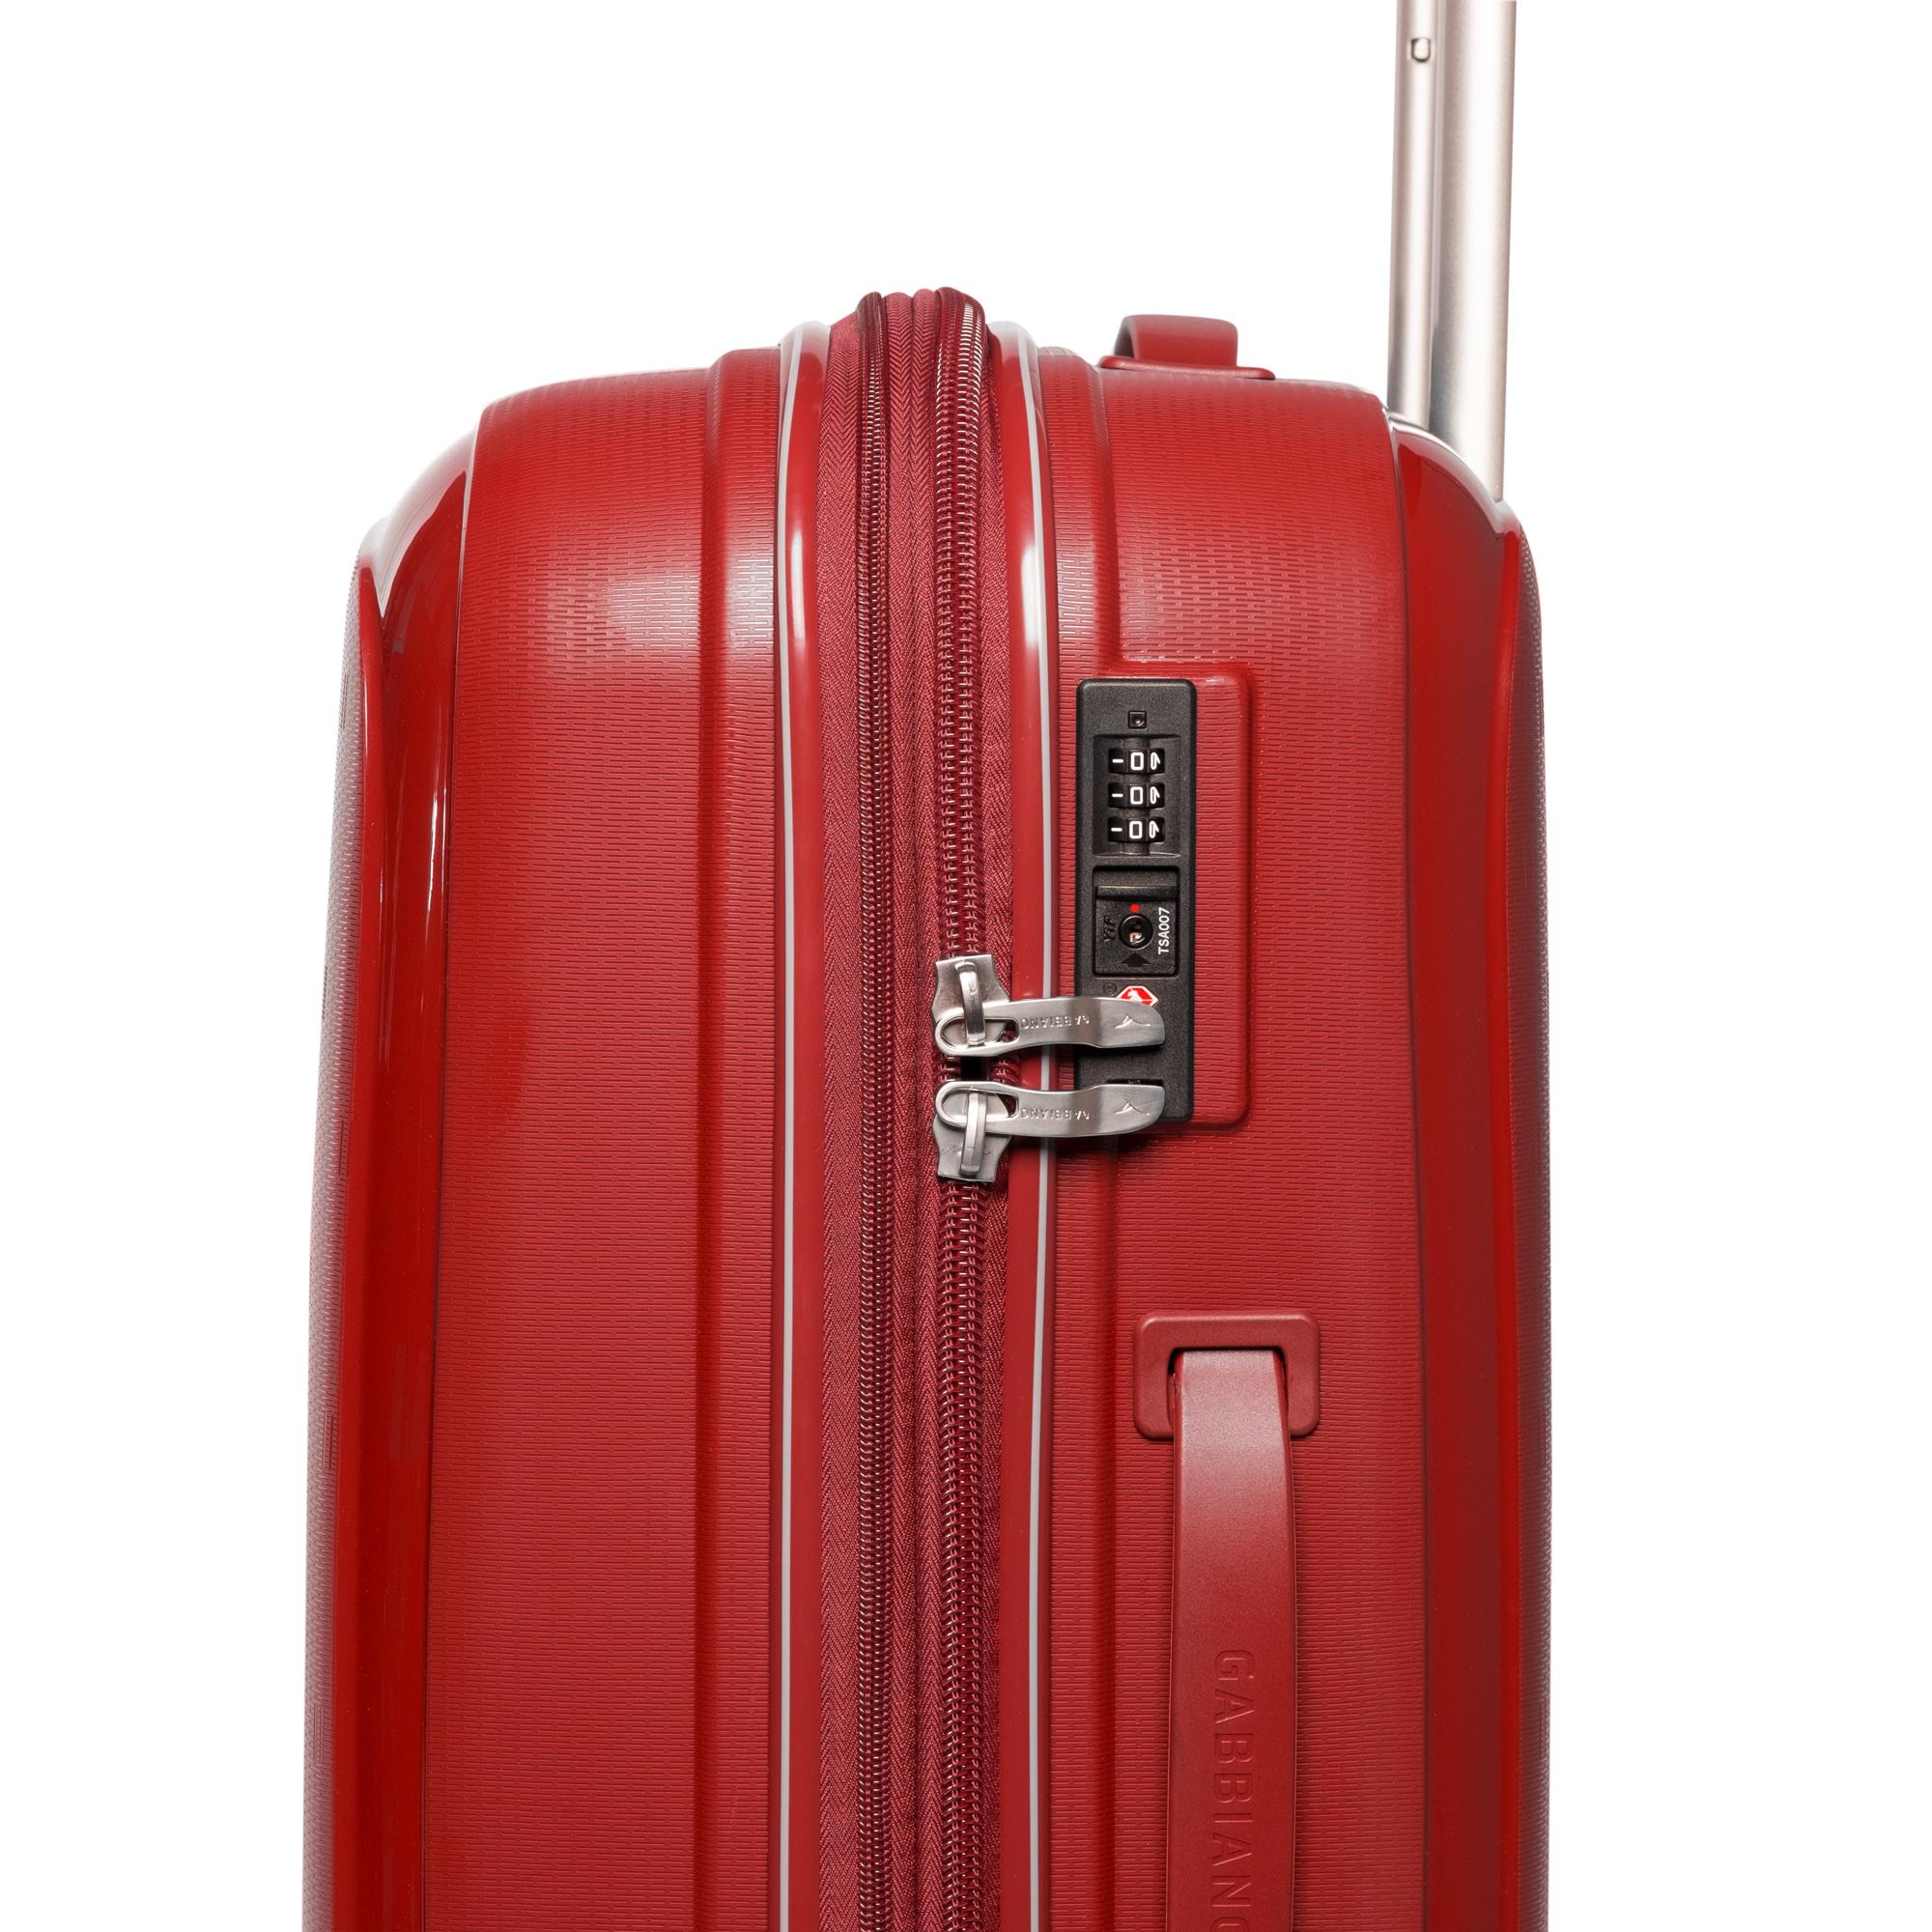 GA1150-lock-red-2k